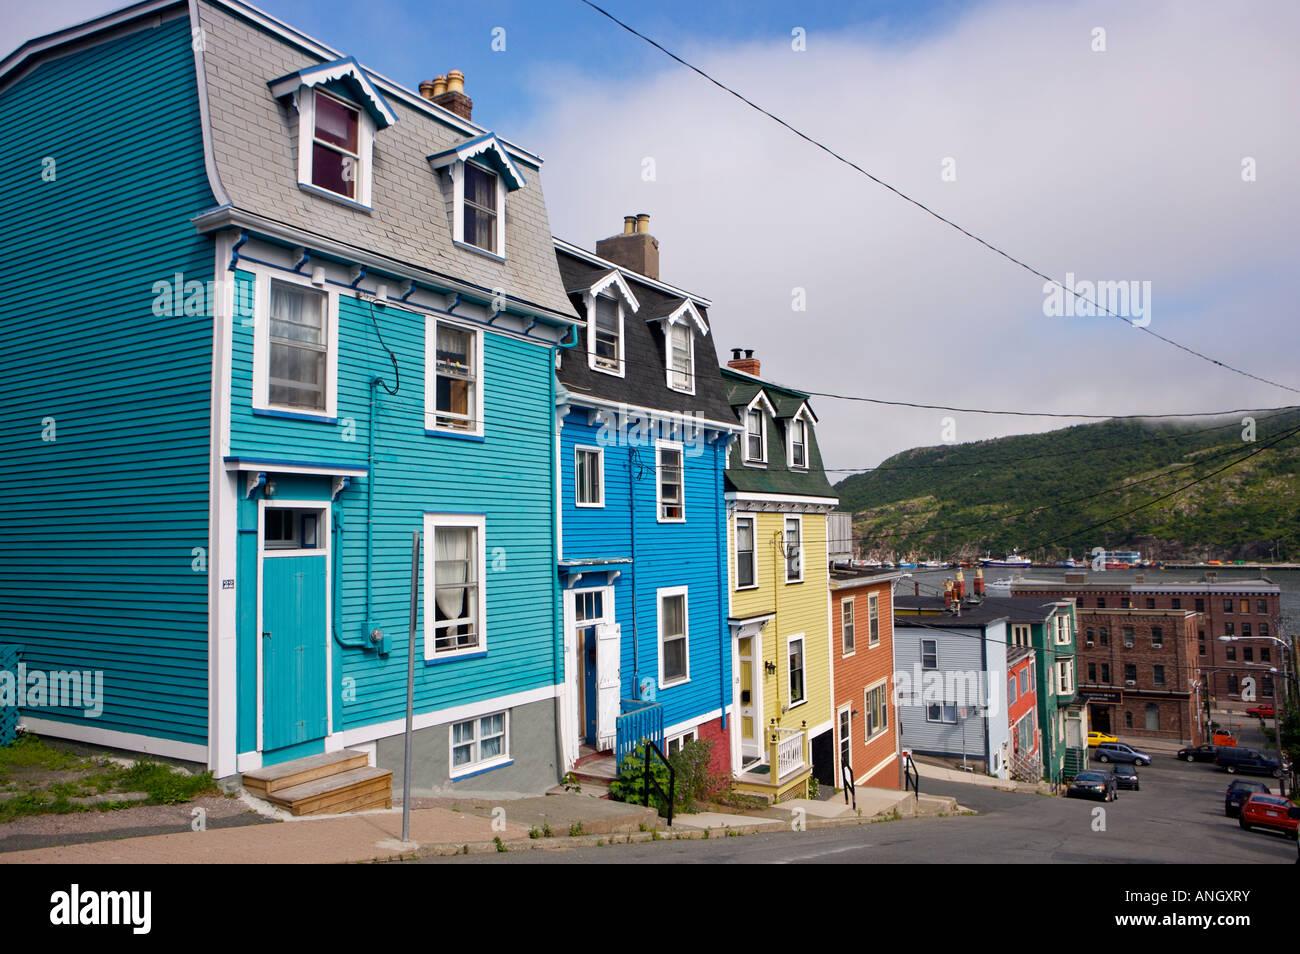 Jelly Bean Row >> The charming houses in downtown St John's (aka Jelly Bean Row), St Stock Photo, Royalty Free ...